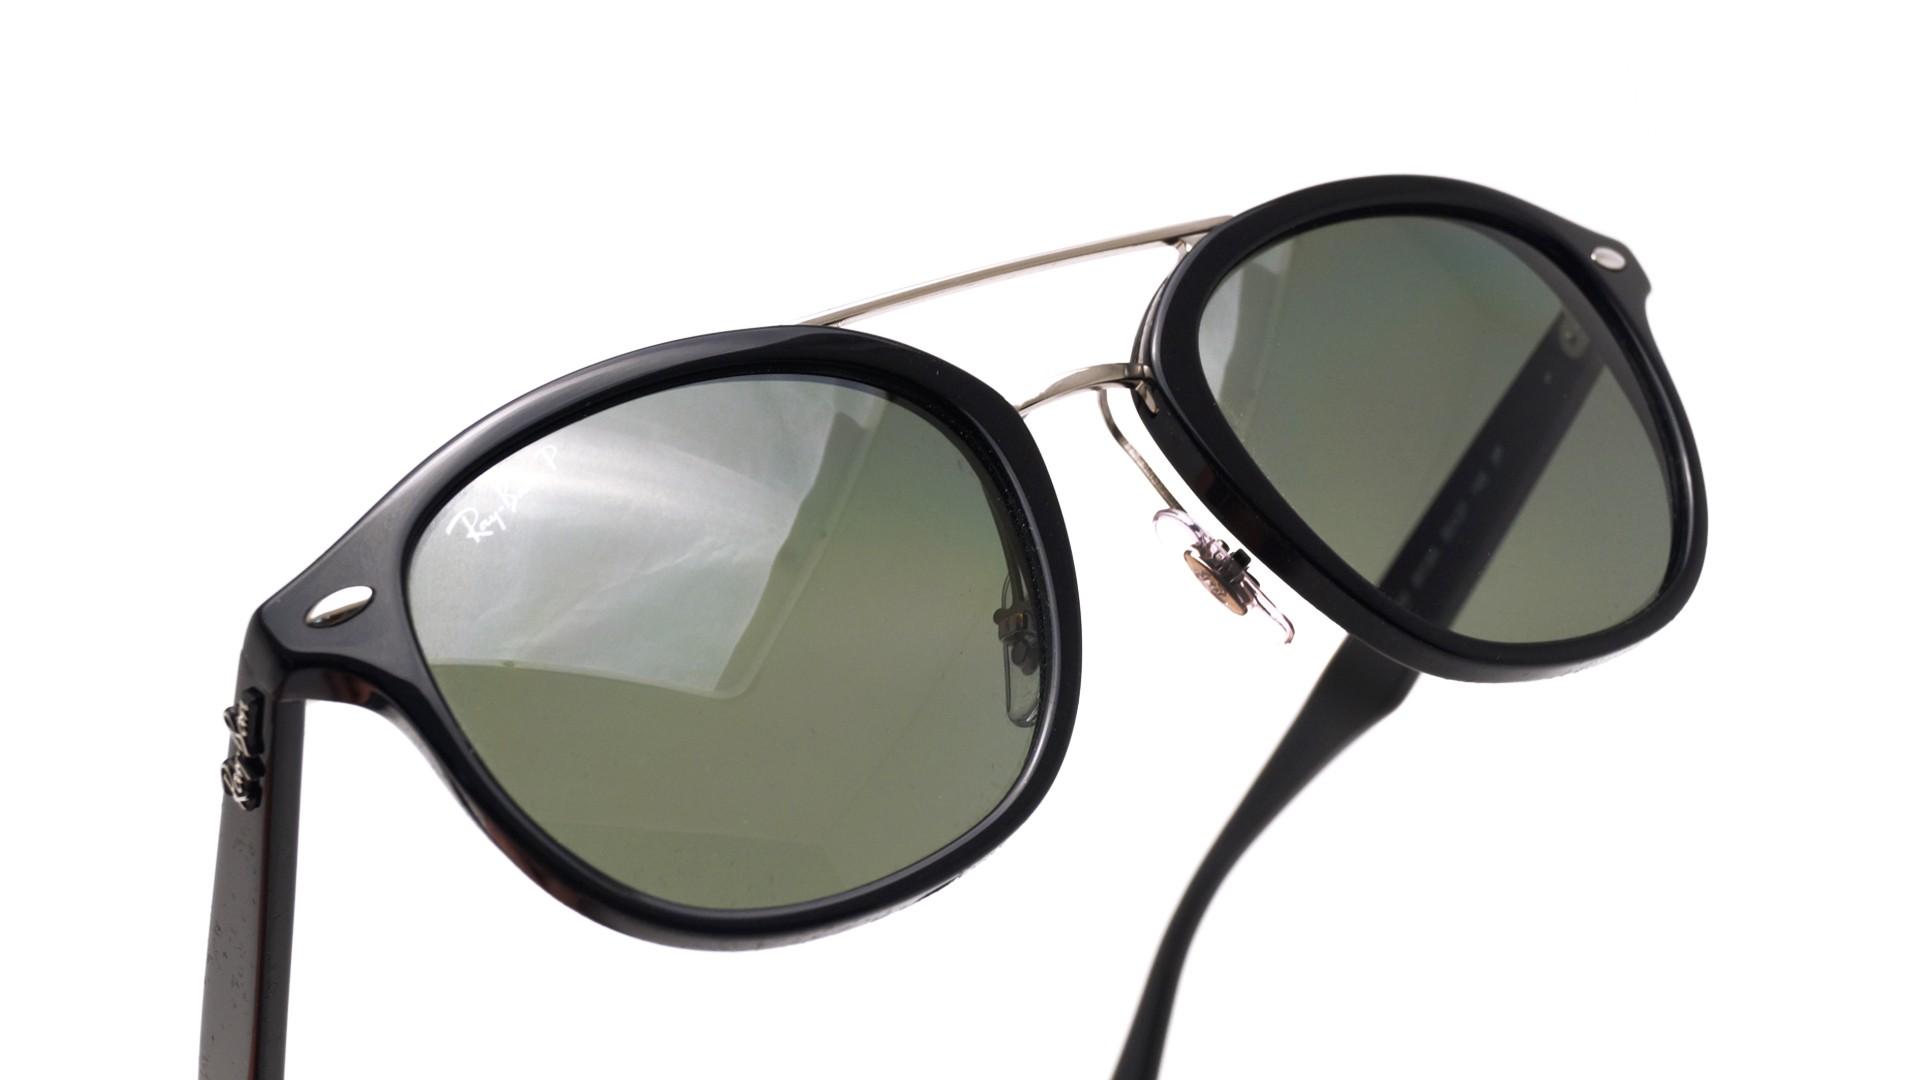 261b680f8c Sunglasses Ray-Ban Highstreet Black RB2183 901 9A 53-21 Medium Polarized